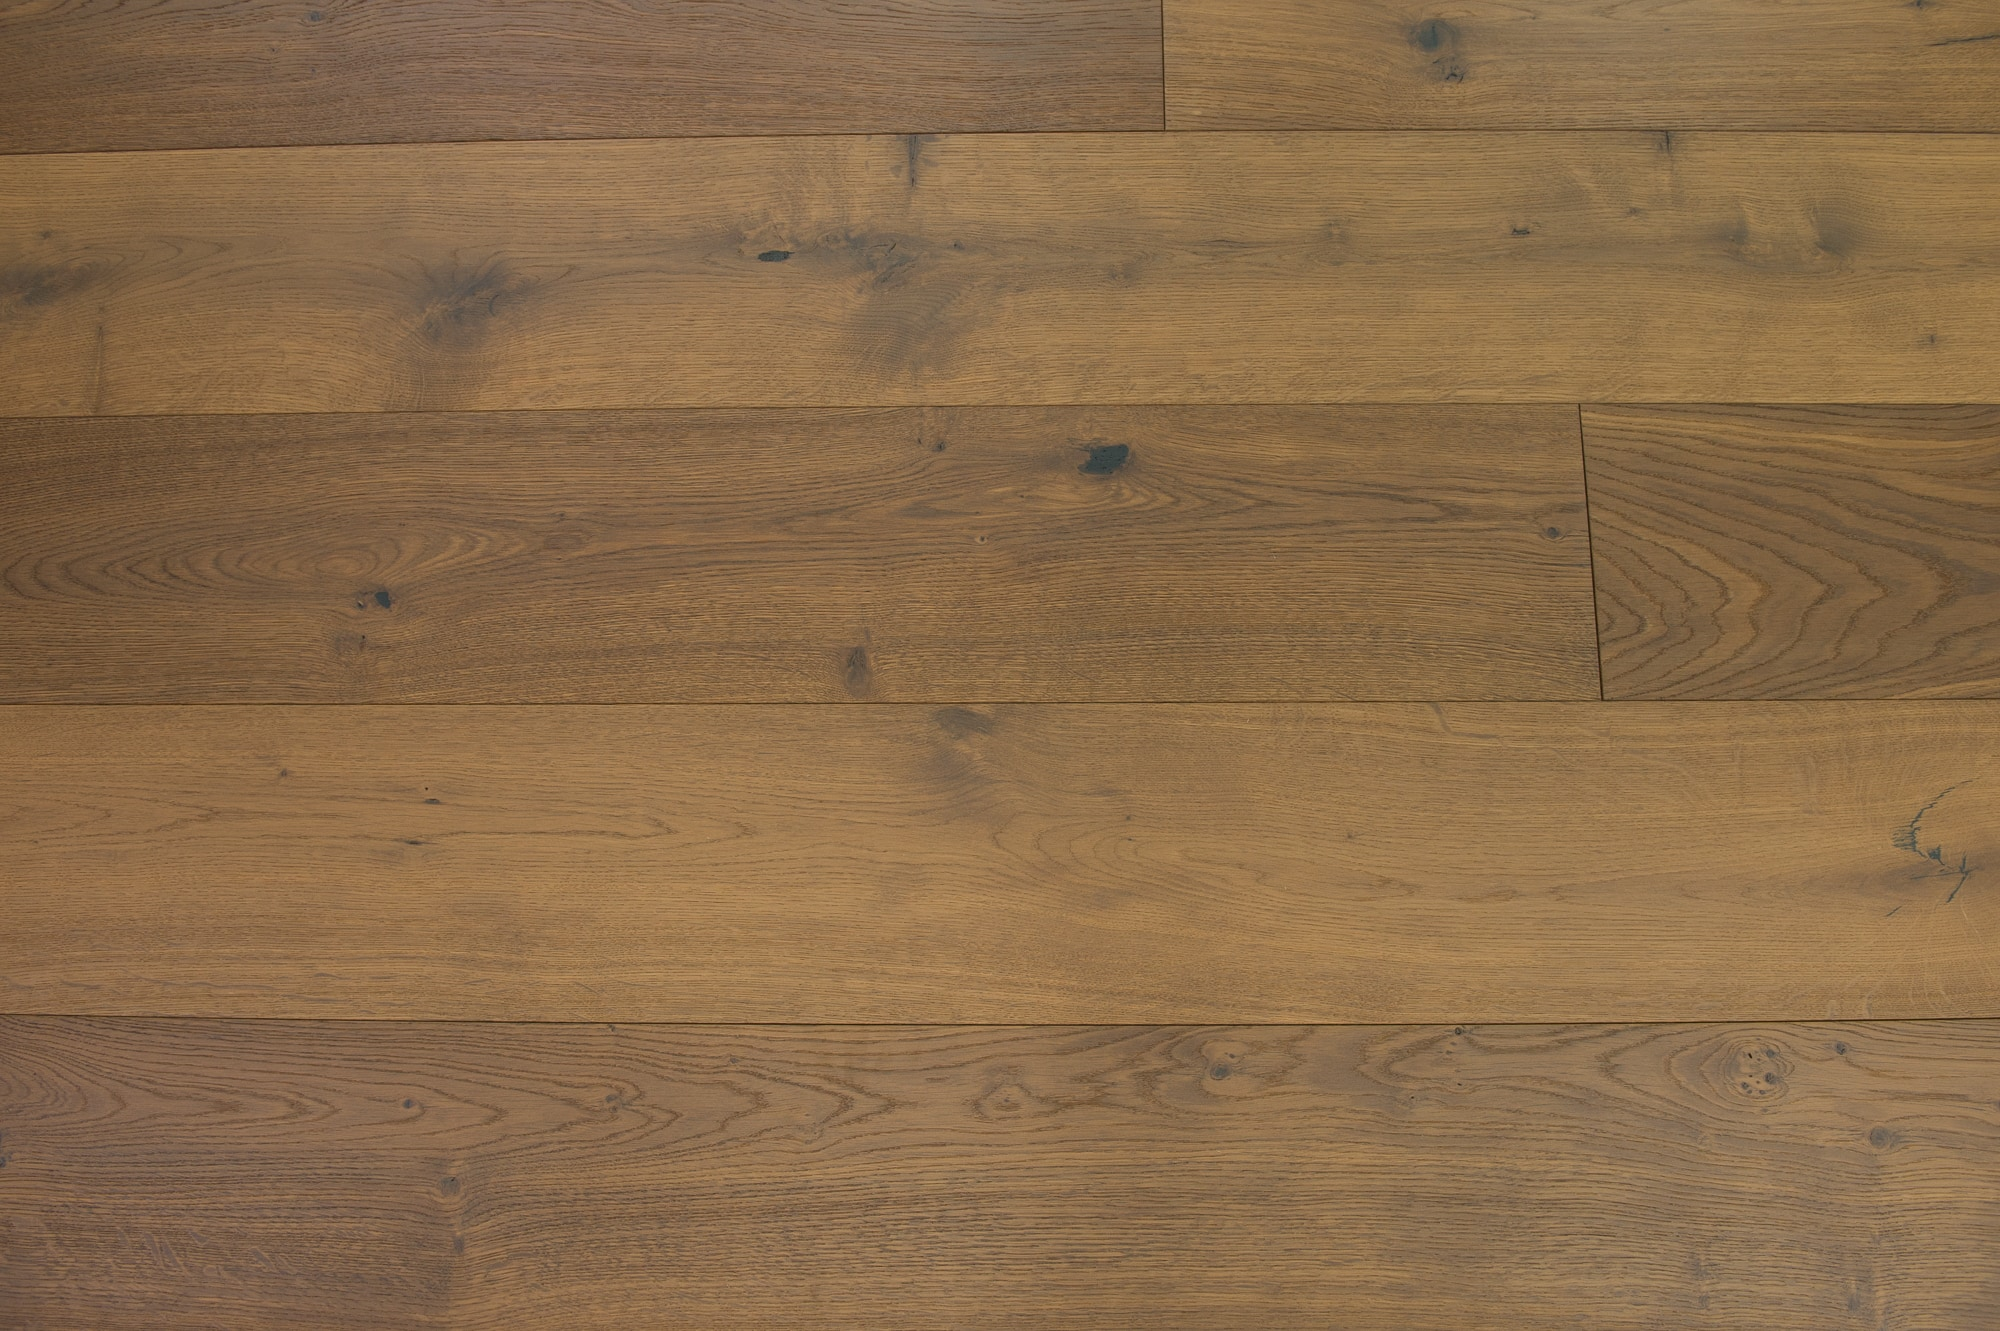 Almond / European White Oak / UV Oil Finish / ABCD / Sample Engineered Hardwood - European White Oak - Denali Collection 0